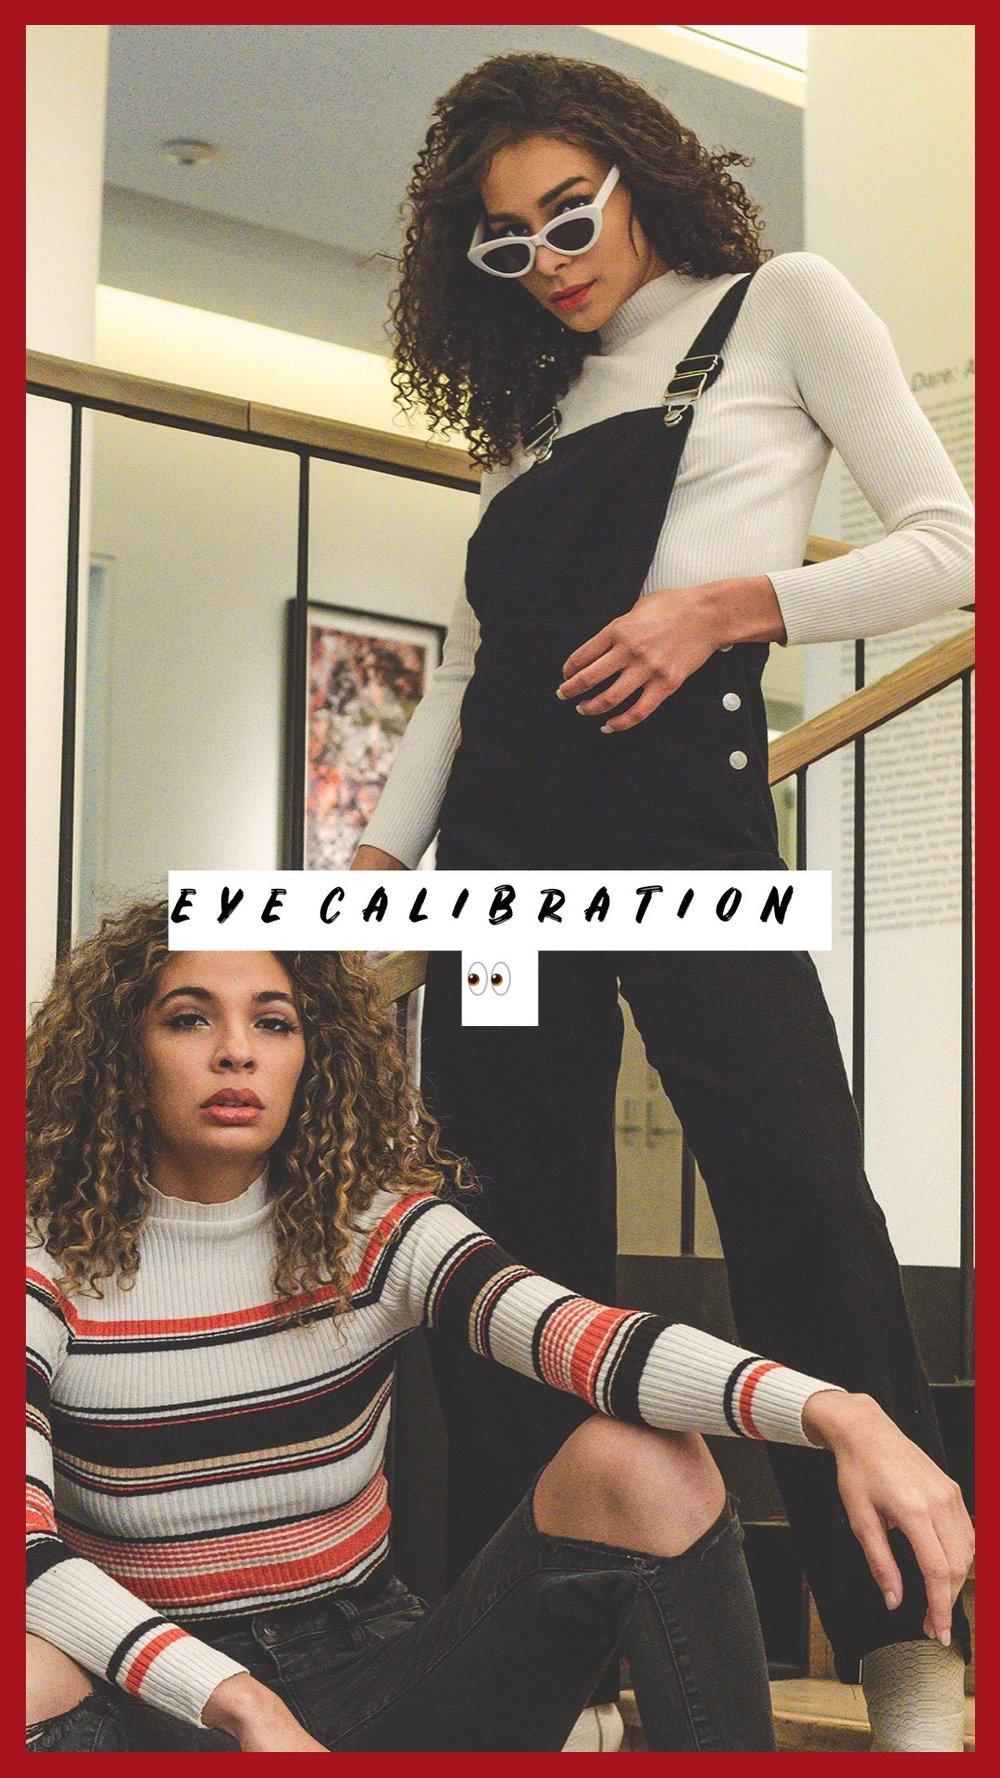 Eye Calibration